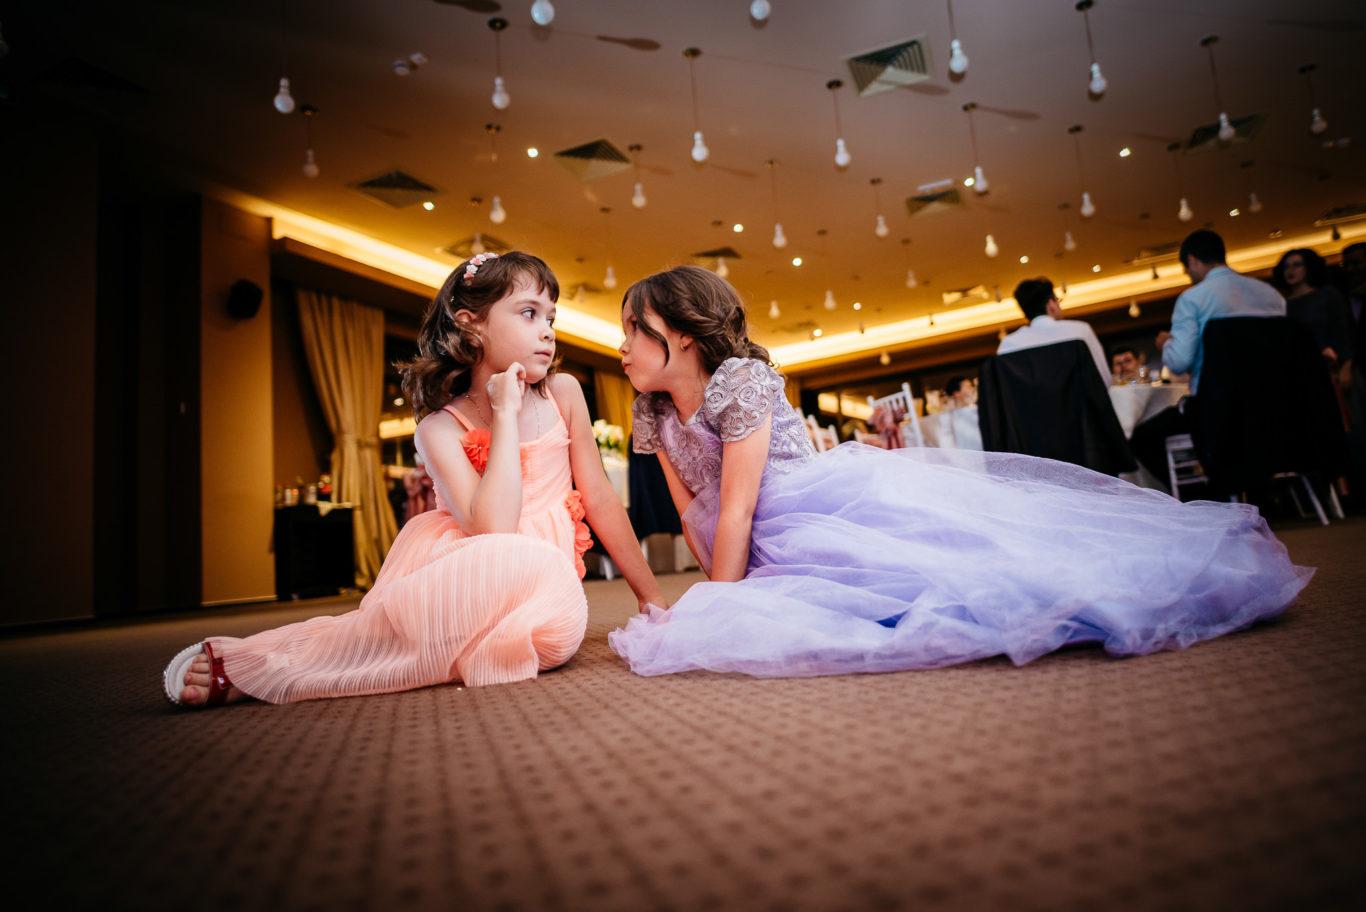 0748-Fotografie-nunta-Bucuresti-Oana-Catalin-fotograf-Ciprian-Dumitrescu-DSC_5251